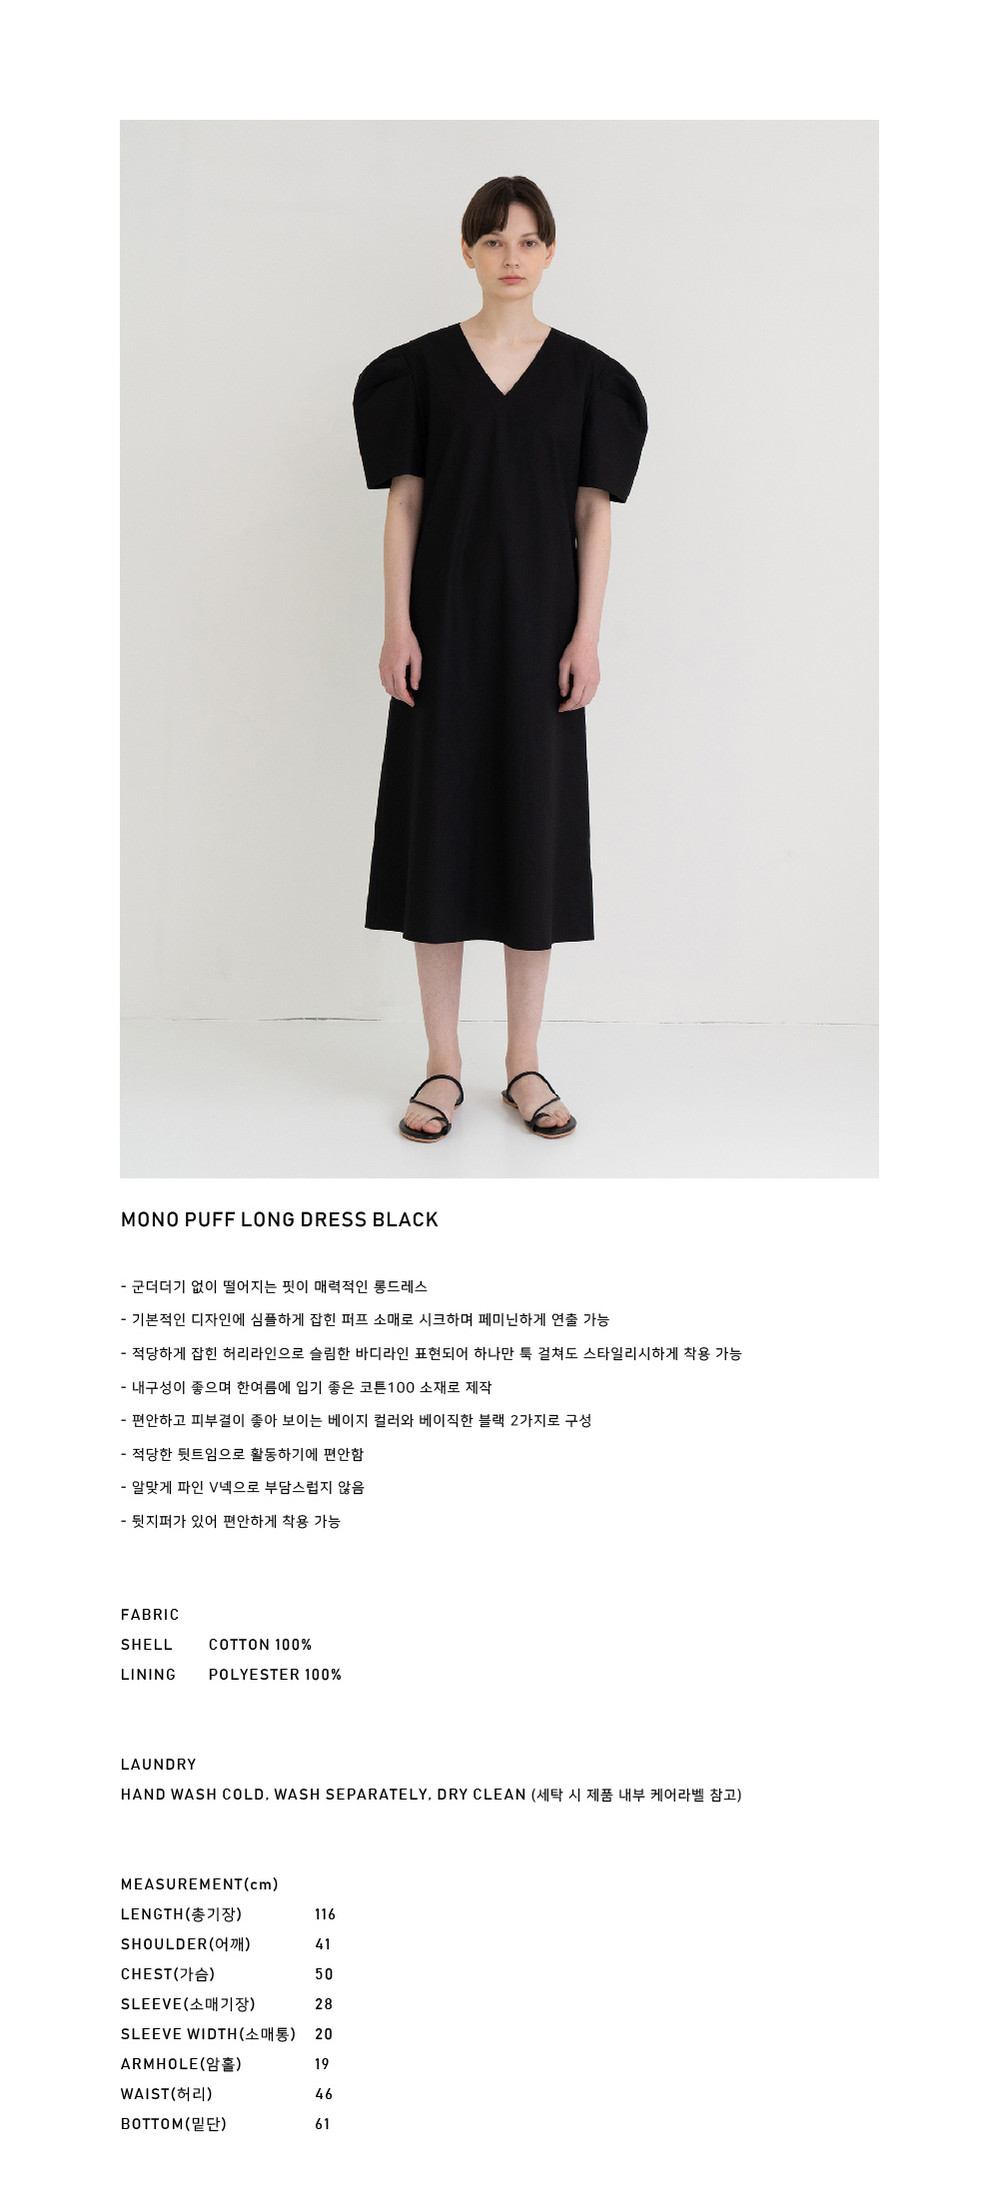 MONO PUFF LONG DRESS BLACK